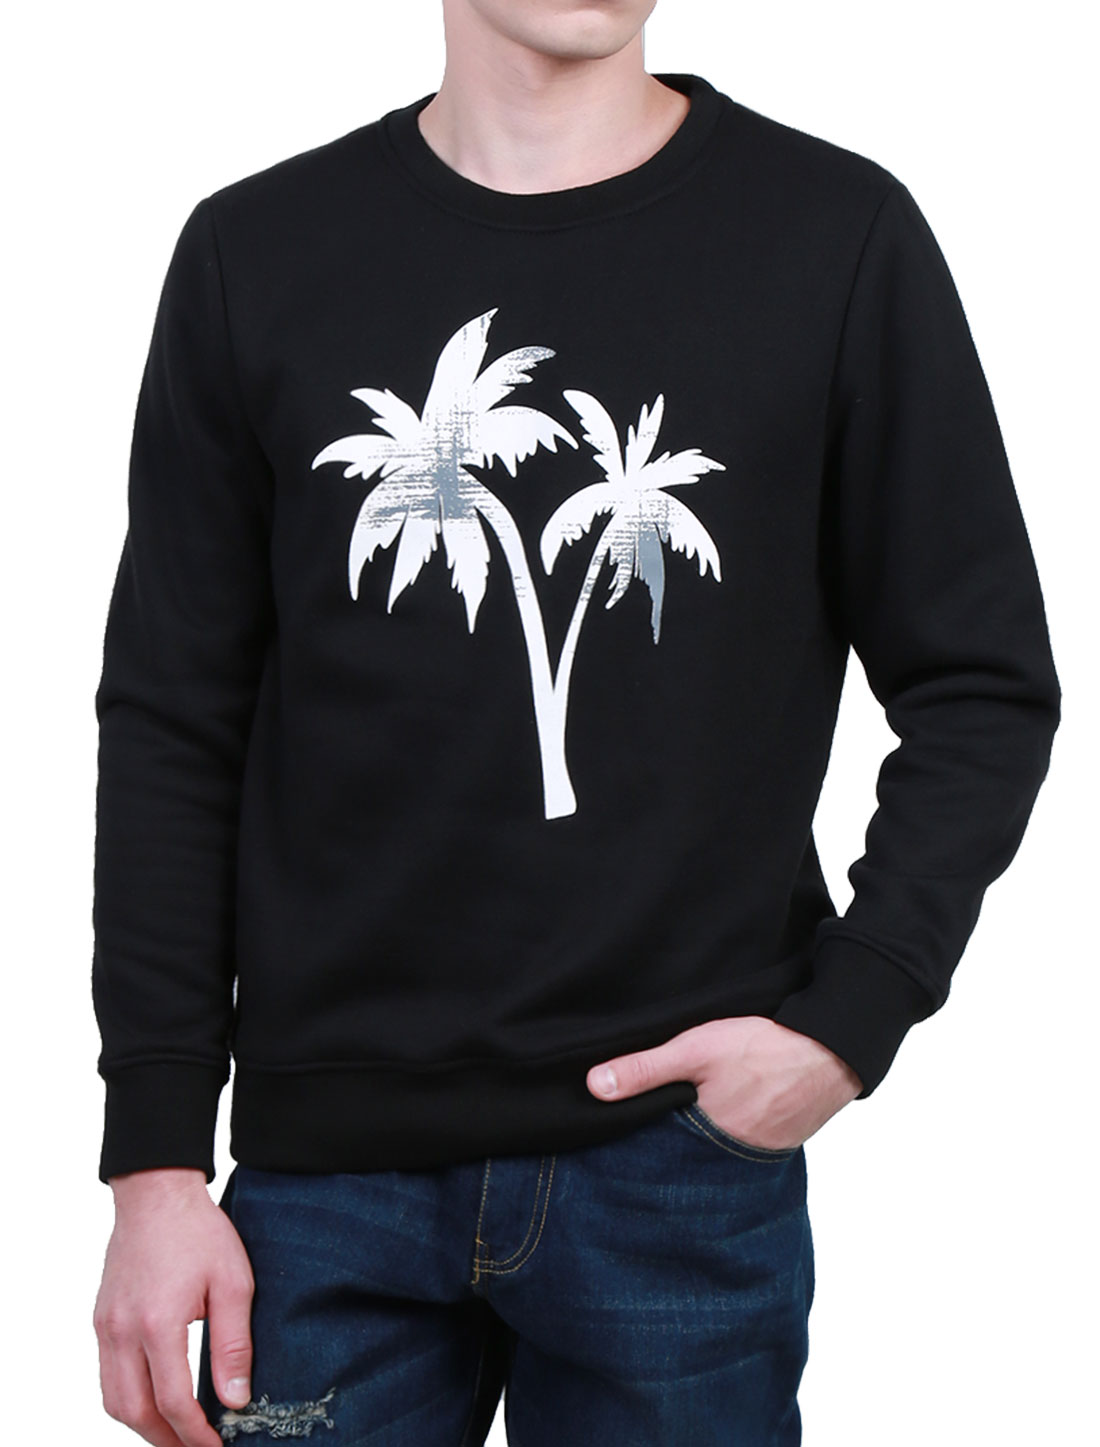 Men Tree Print Crew Neck Long Sleeves Fleece Pullover Sweatshirt Black L